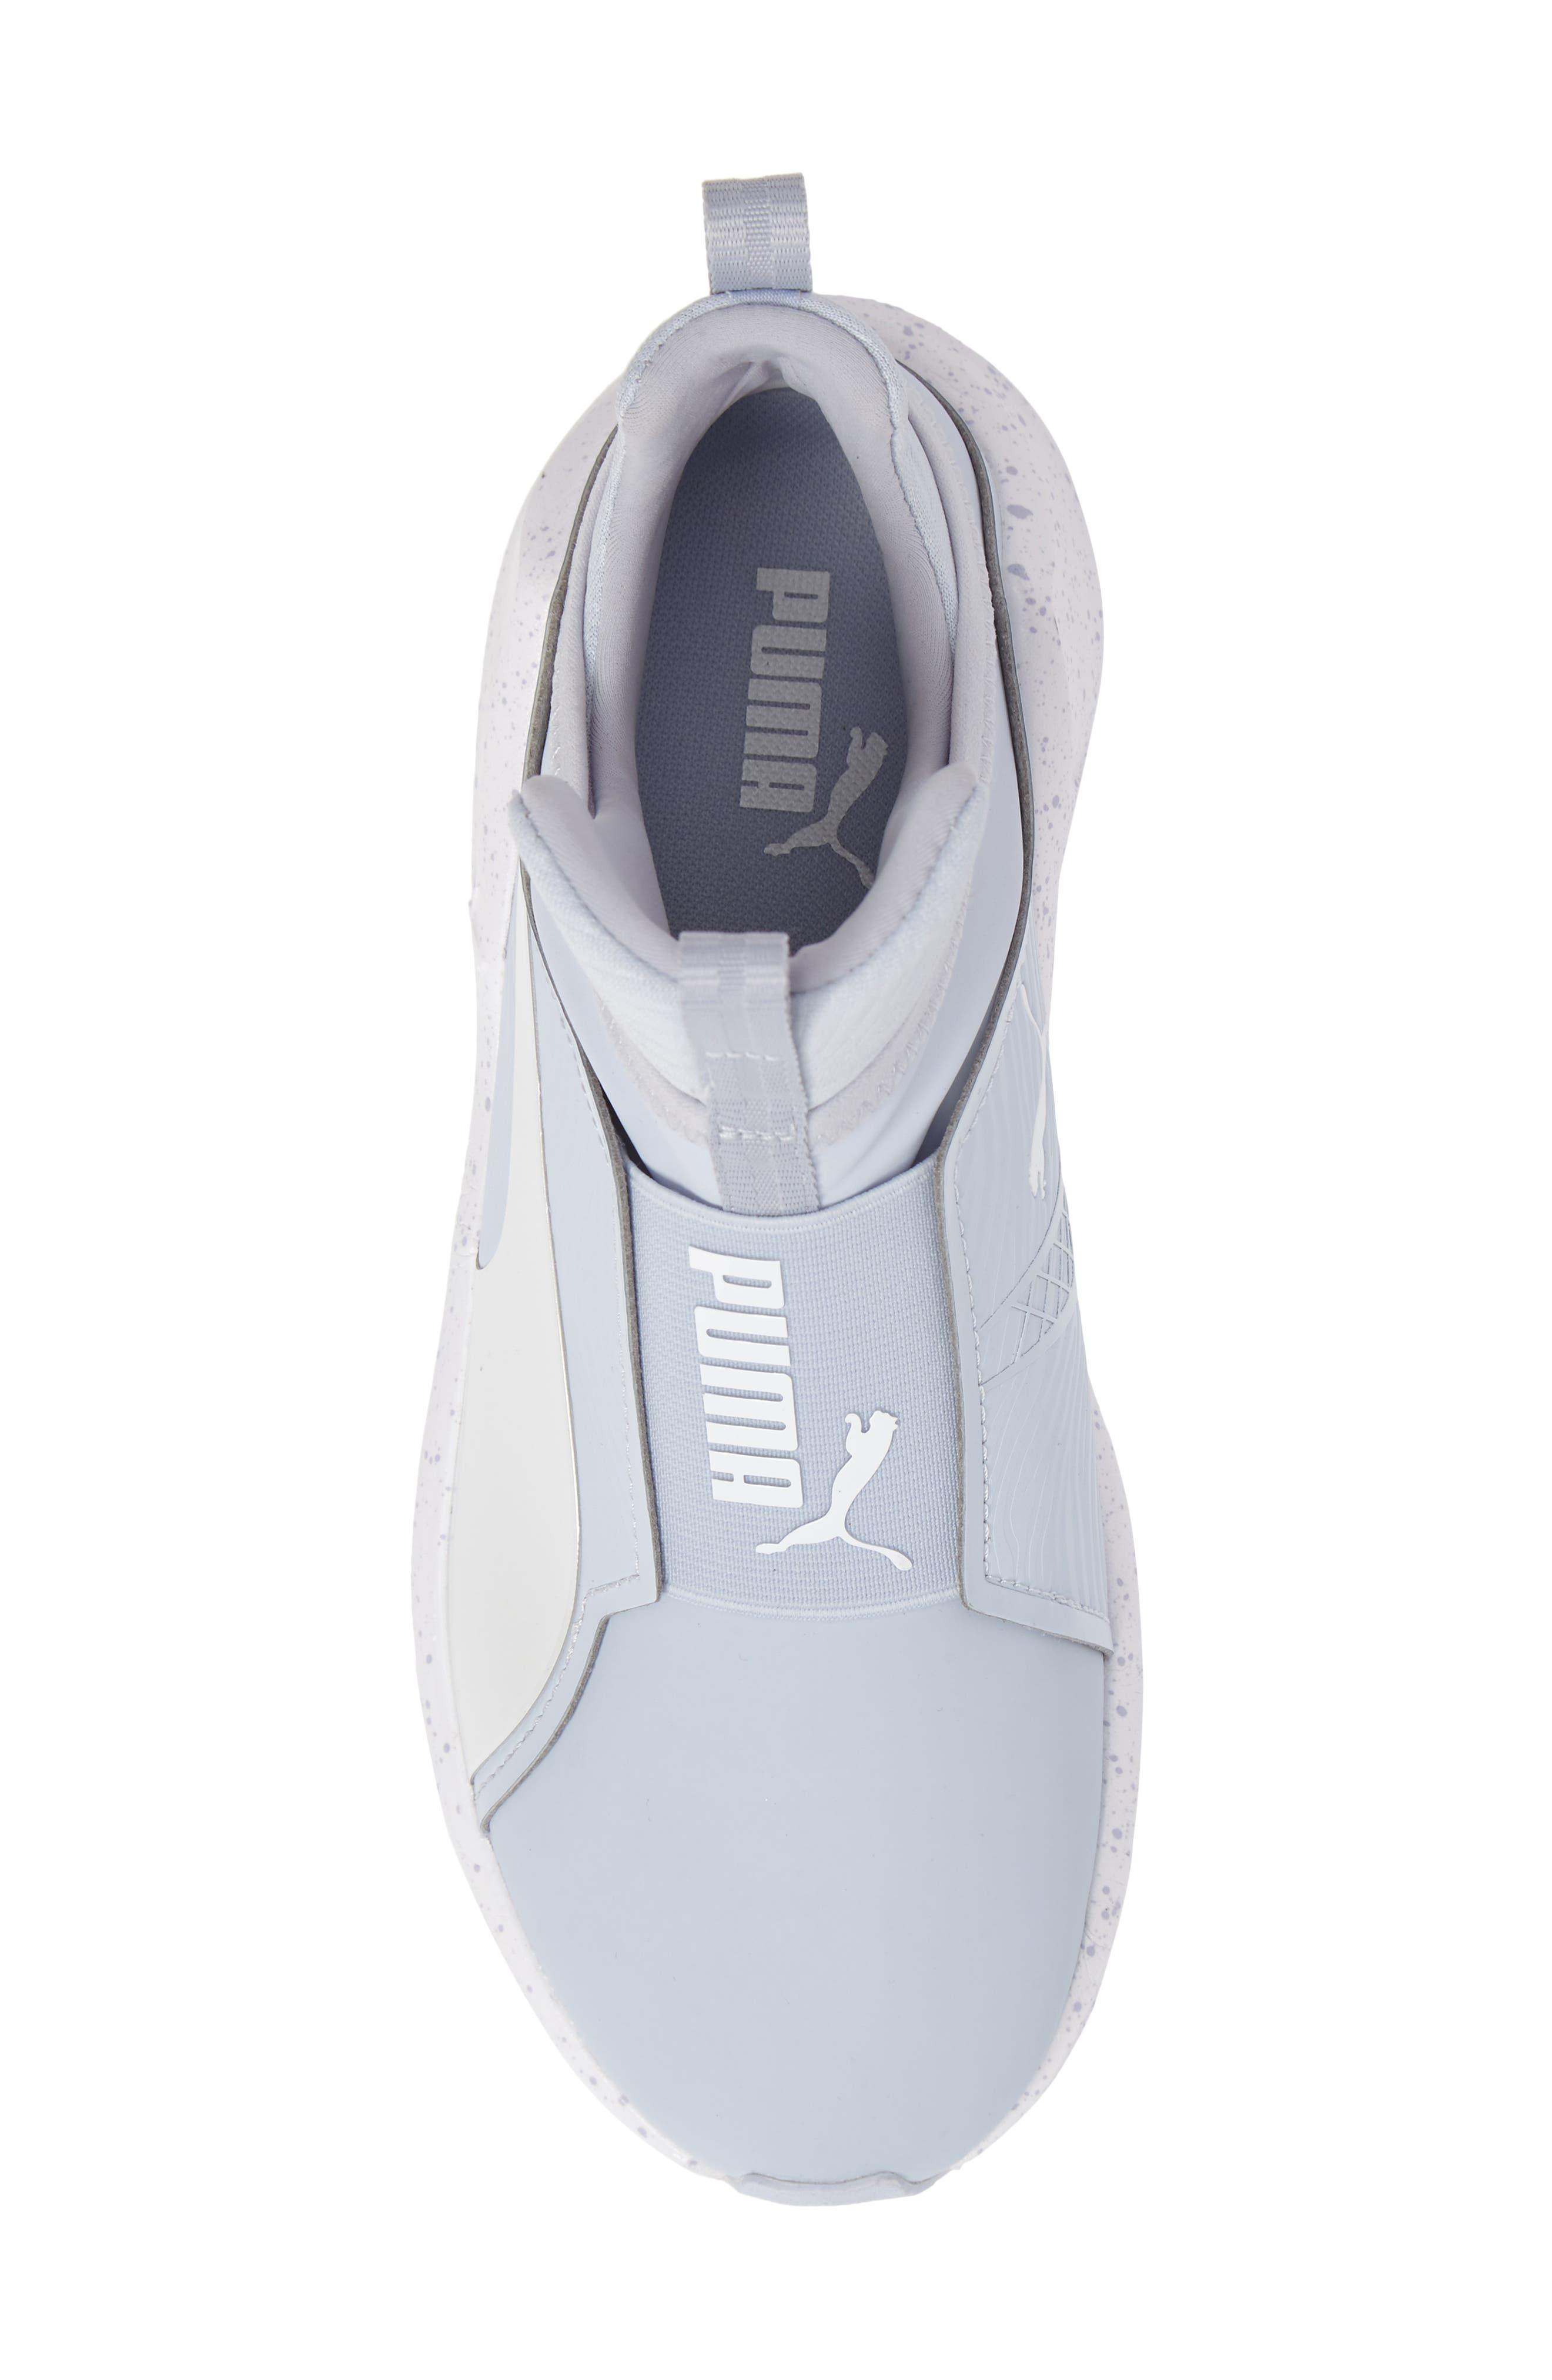 Fierce Bleached High Top Sneaker,                             Alternate thumbnail 5, color,                             400